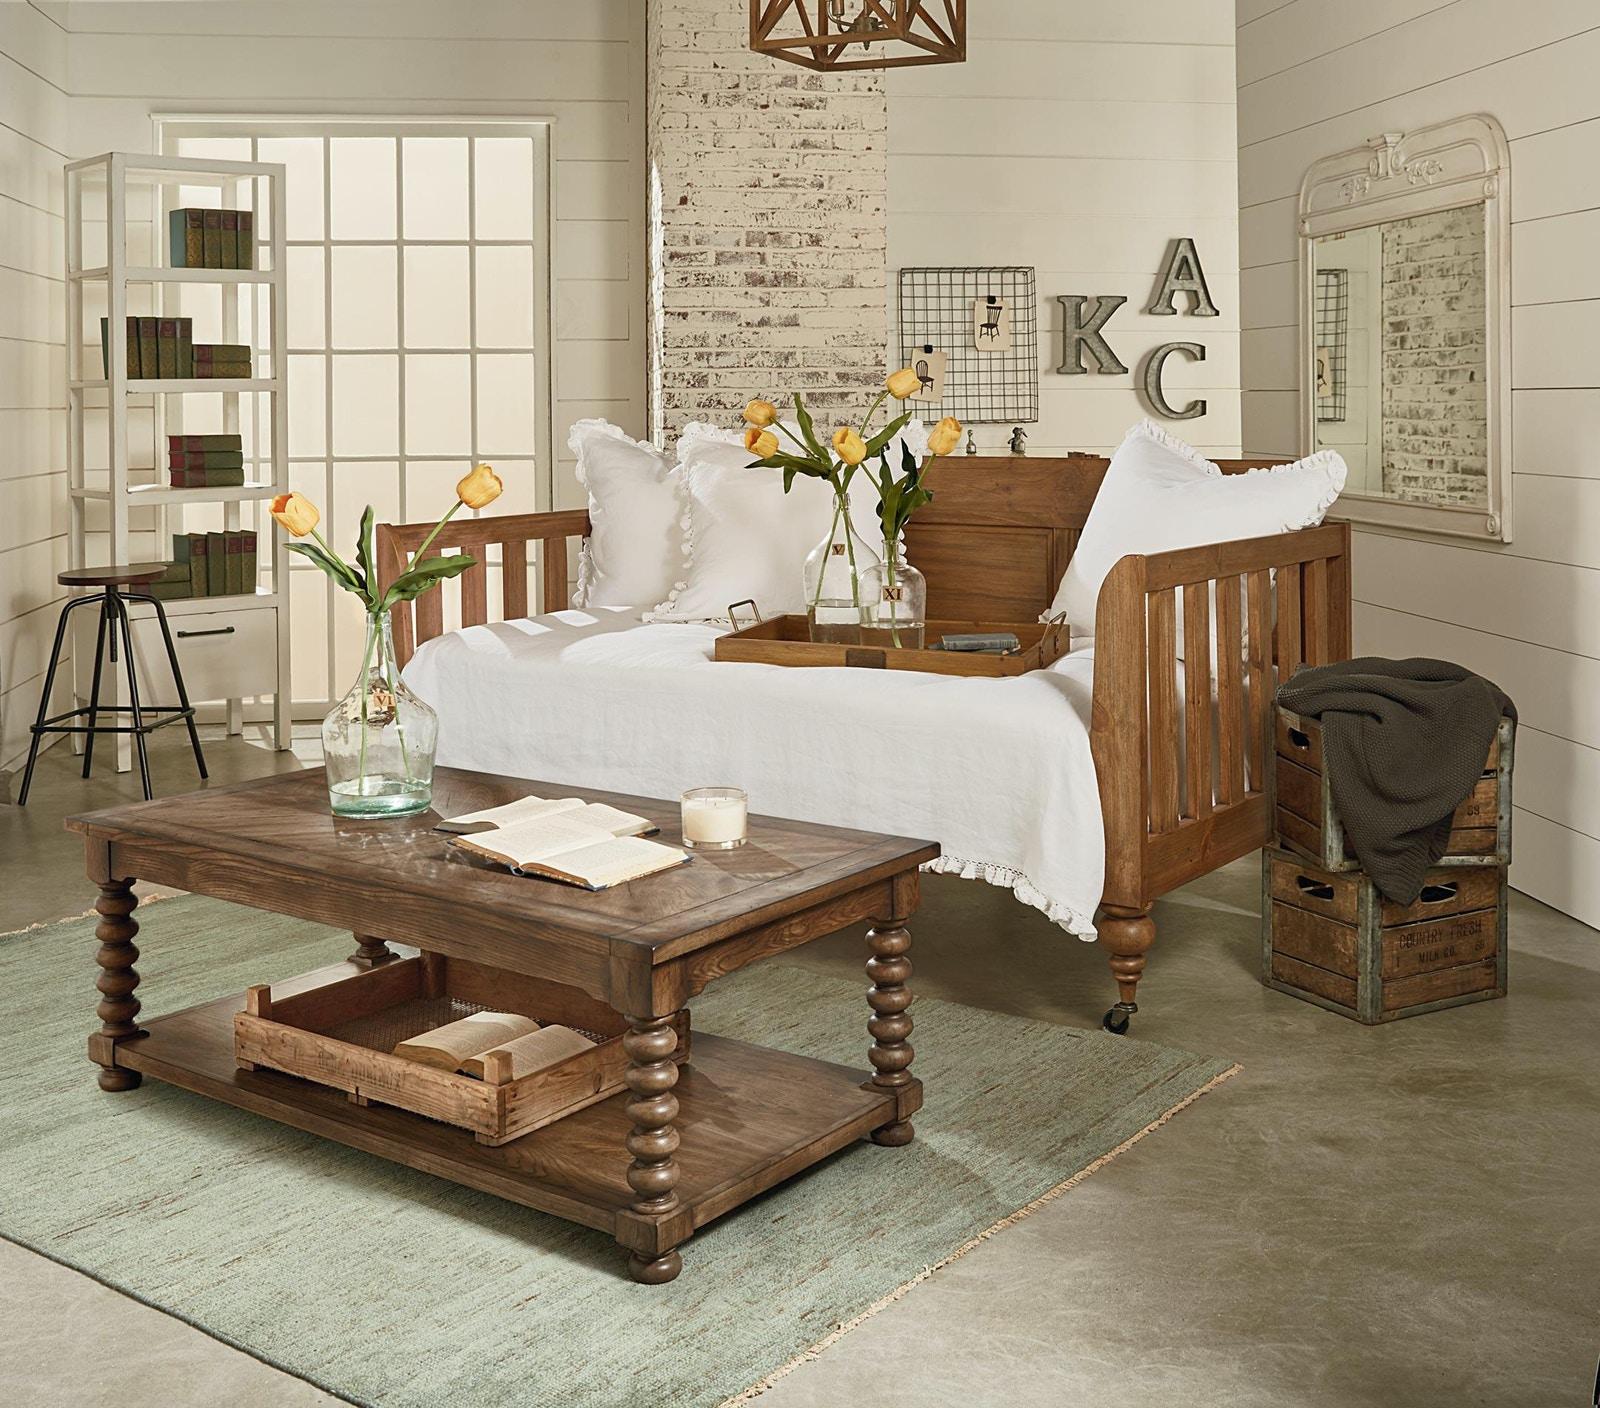 Magnolia Home Bedroom Primitive Elegance Daybed 051509 Furniture Fair Cincinnati Dayton Oh